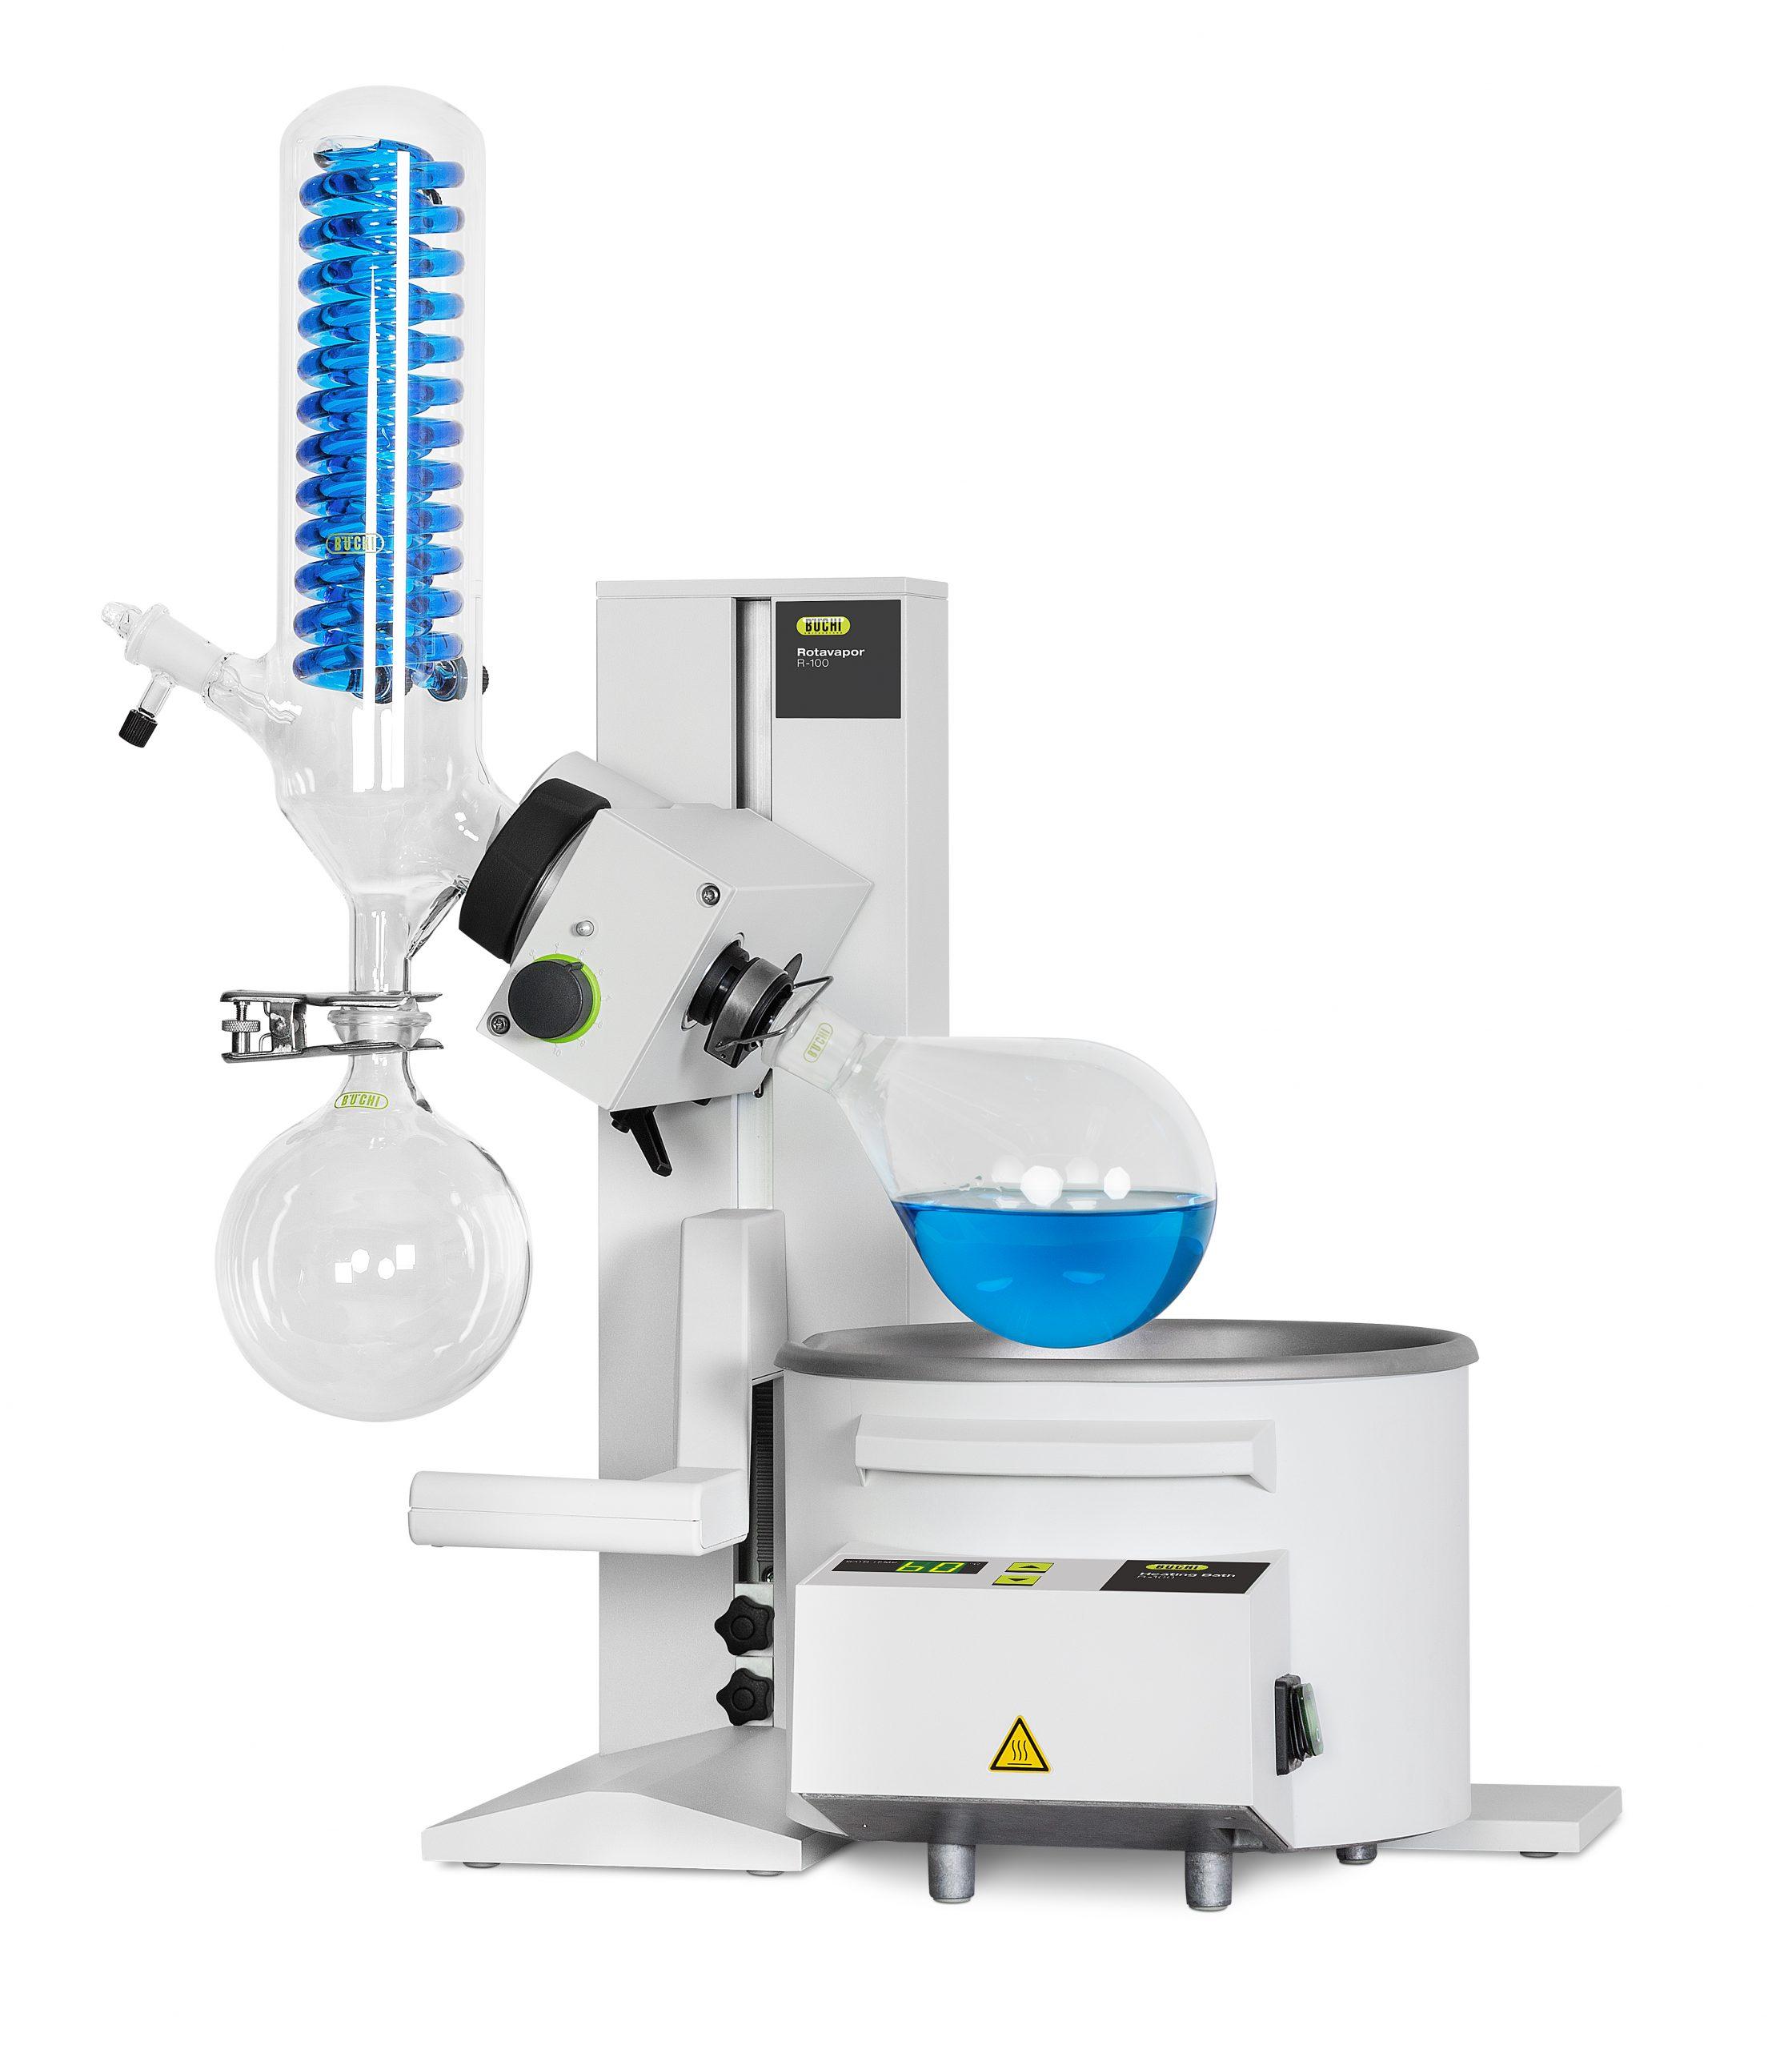 Rotavapor® R-100 Image